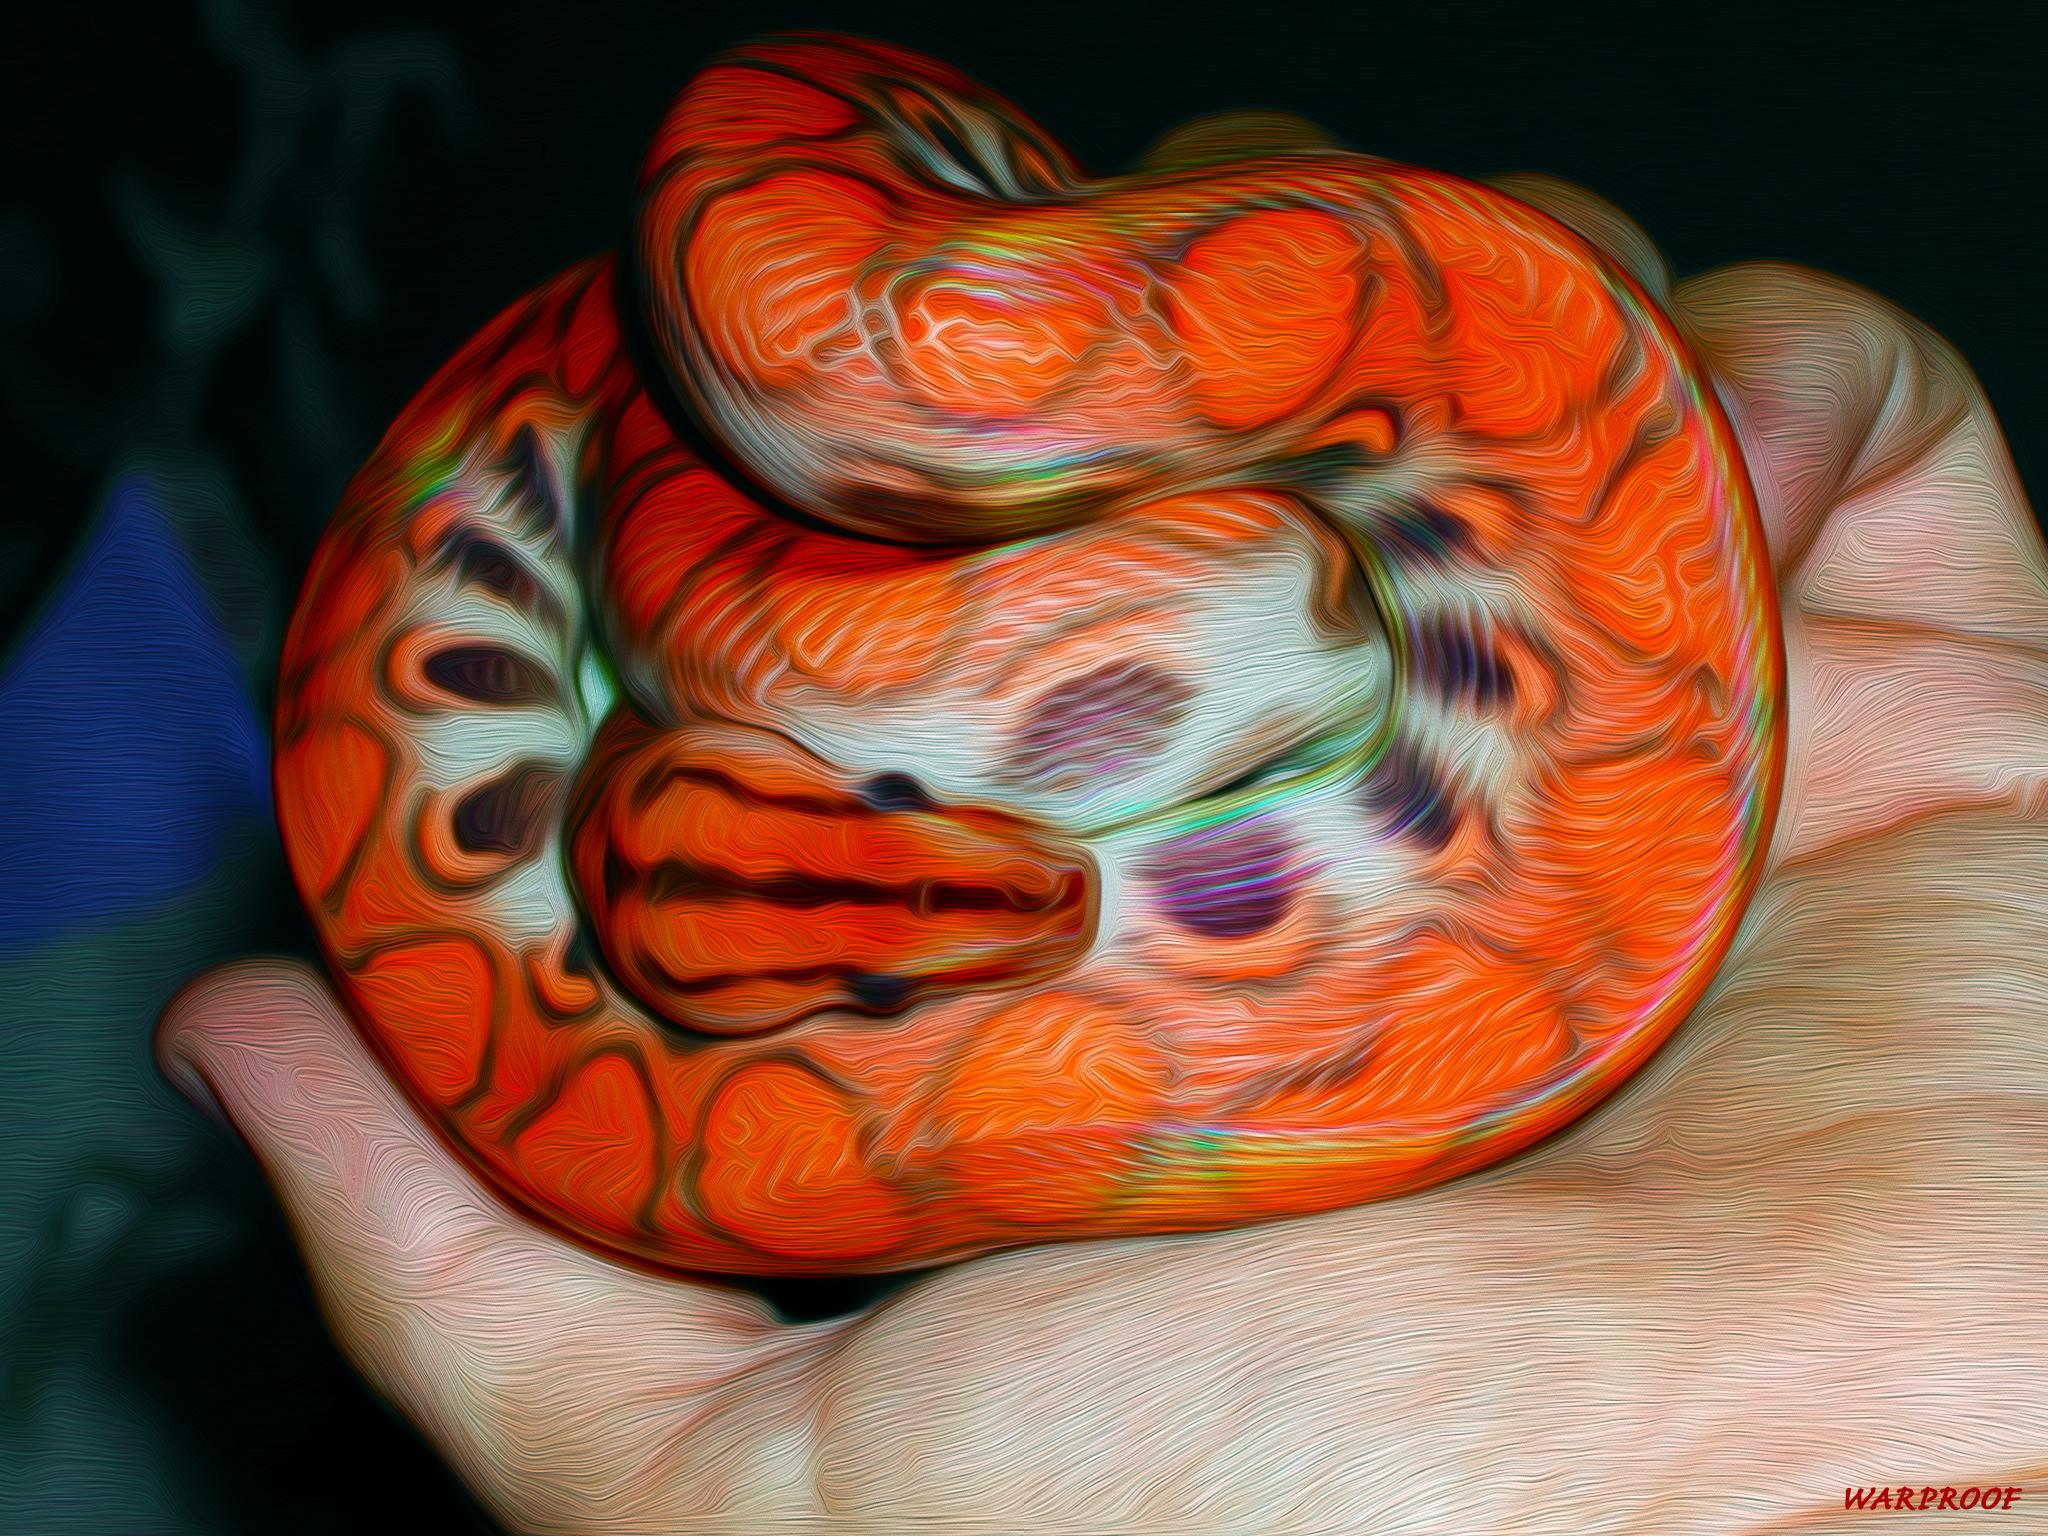 Cute Snake Hd Wallpaper Rainbow Boa Full Hd Wallpaper And Background Image